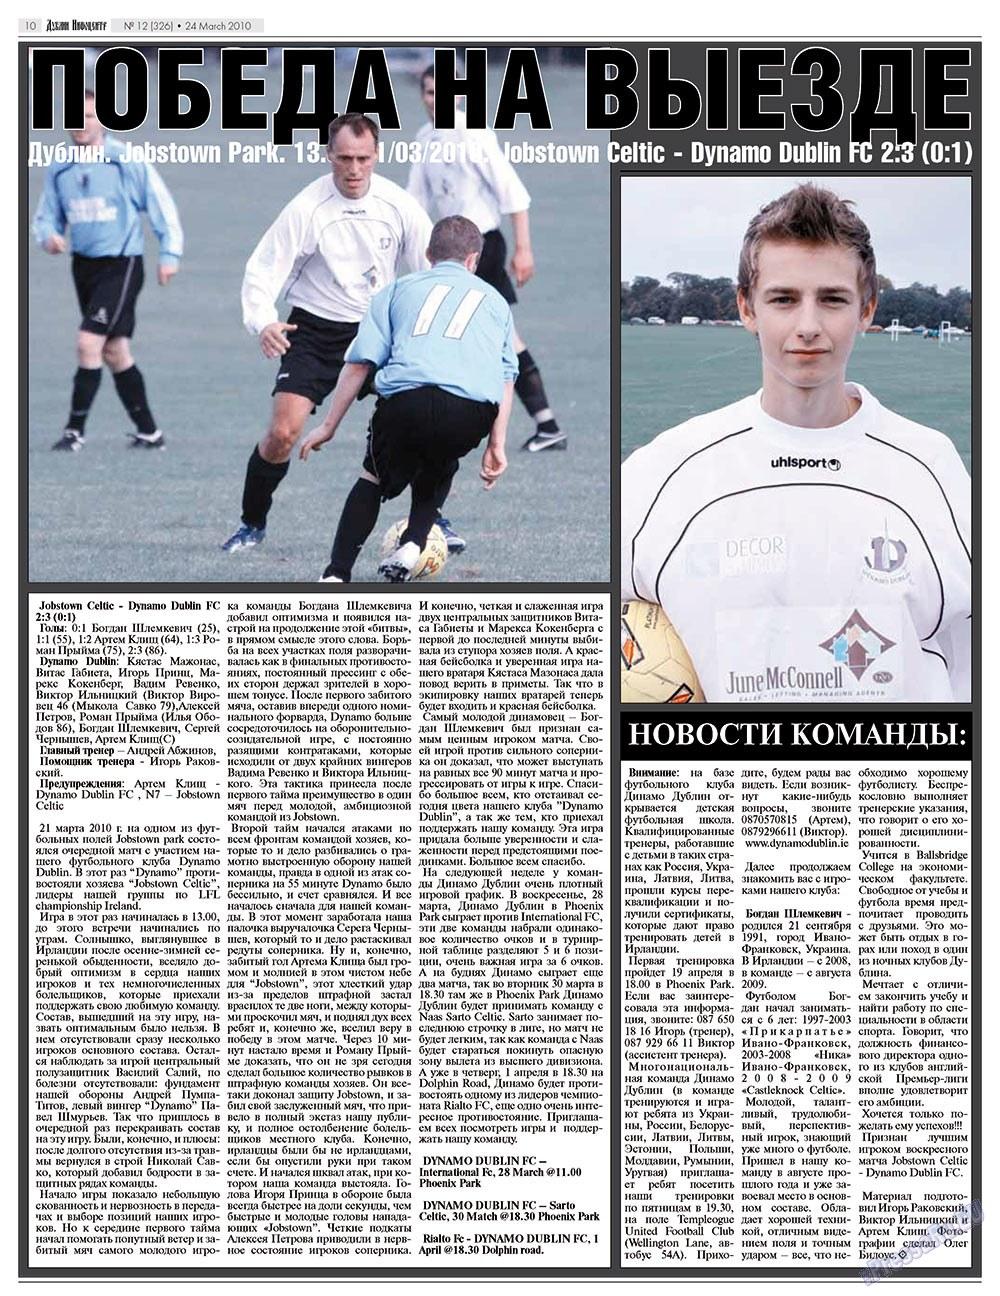 Дублин инфоцентр (газета). 2010 год, номер 12, стр. 10